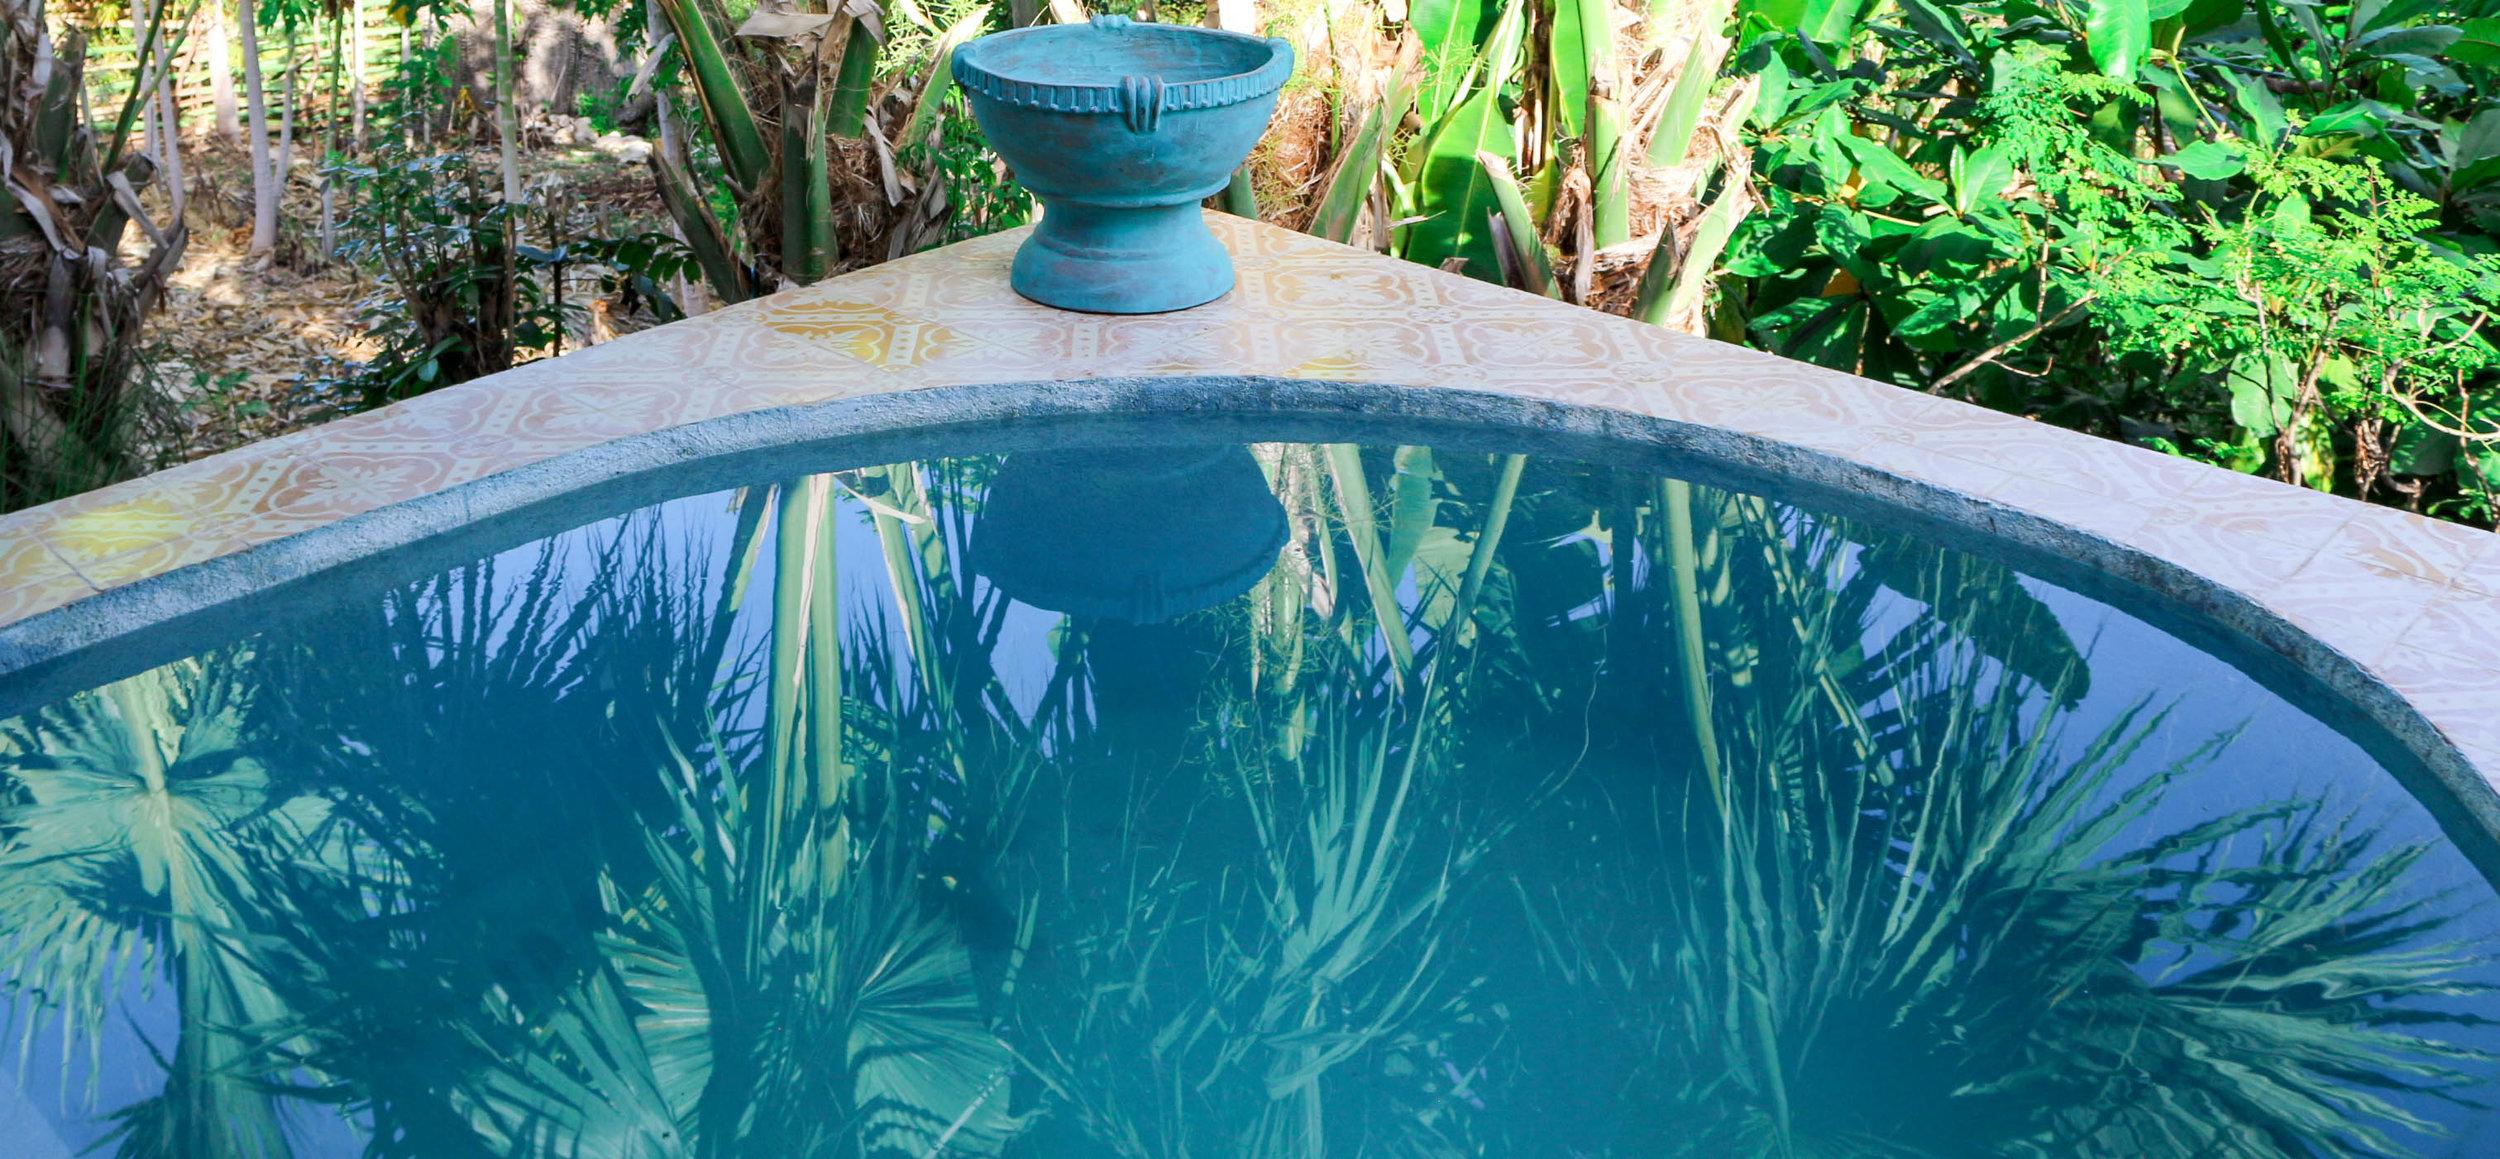 Chic Chateau Haiti Plunge Pool Photo